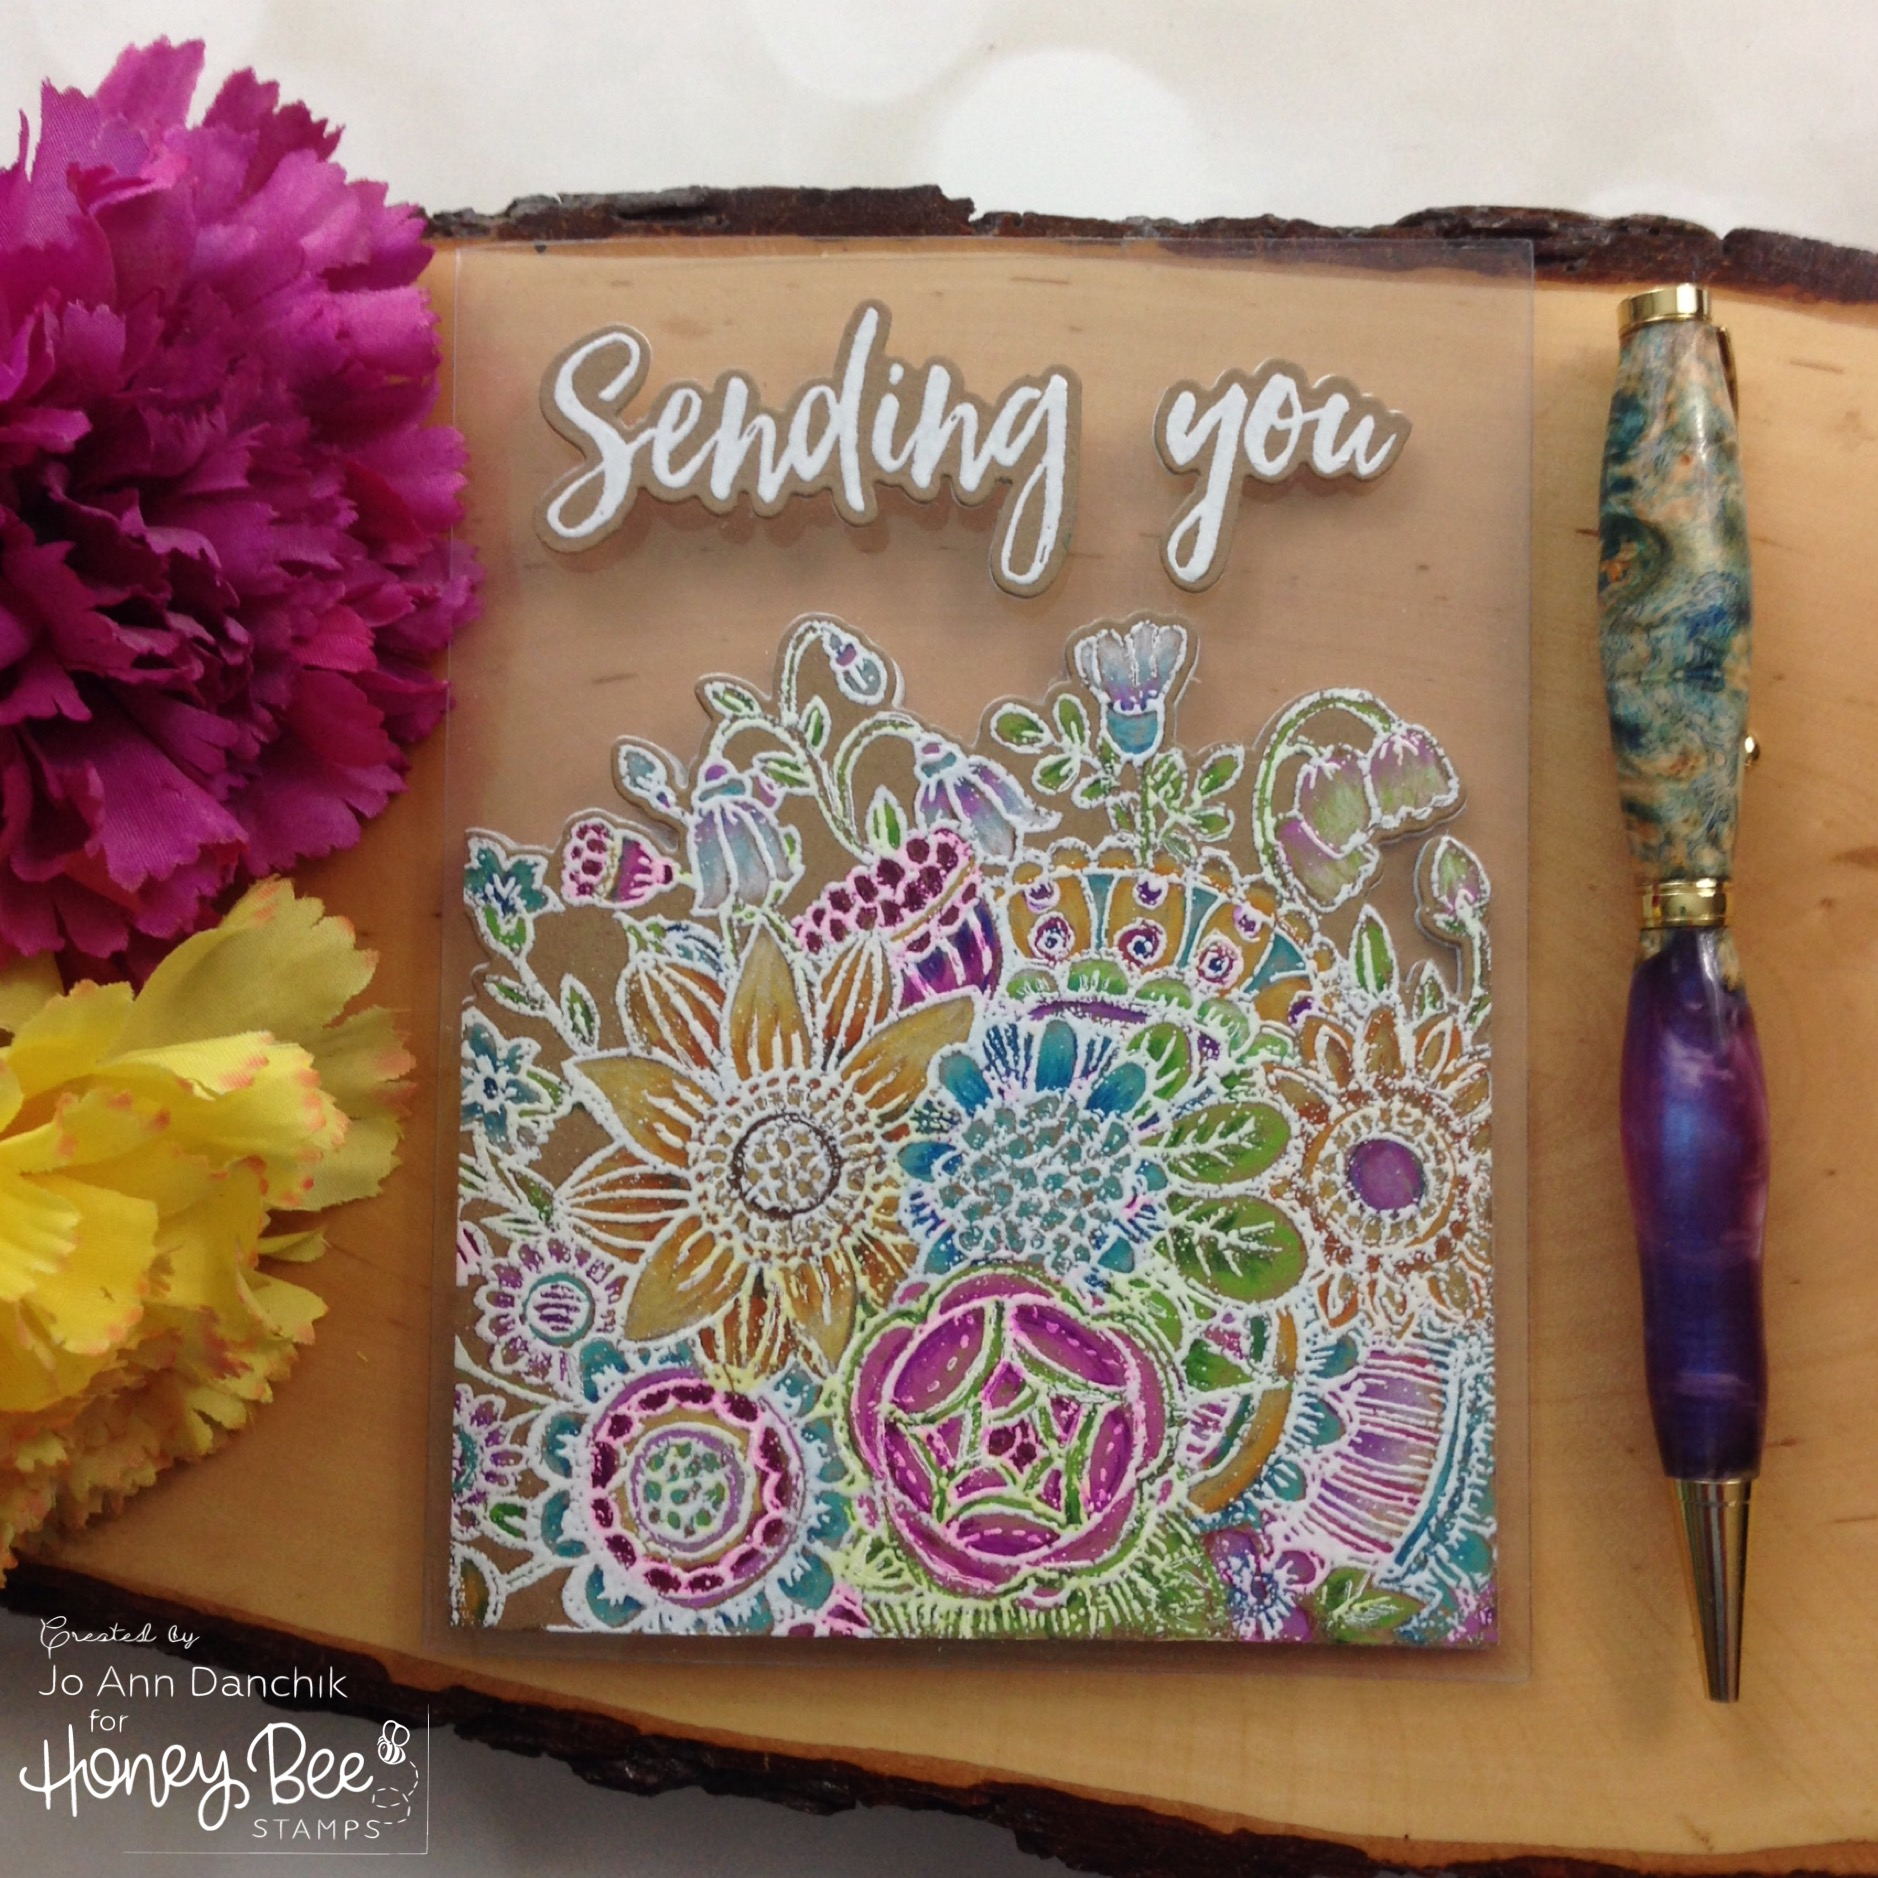 Creative Sundays With Jo Ann: Sending You My Love